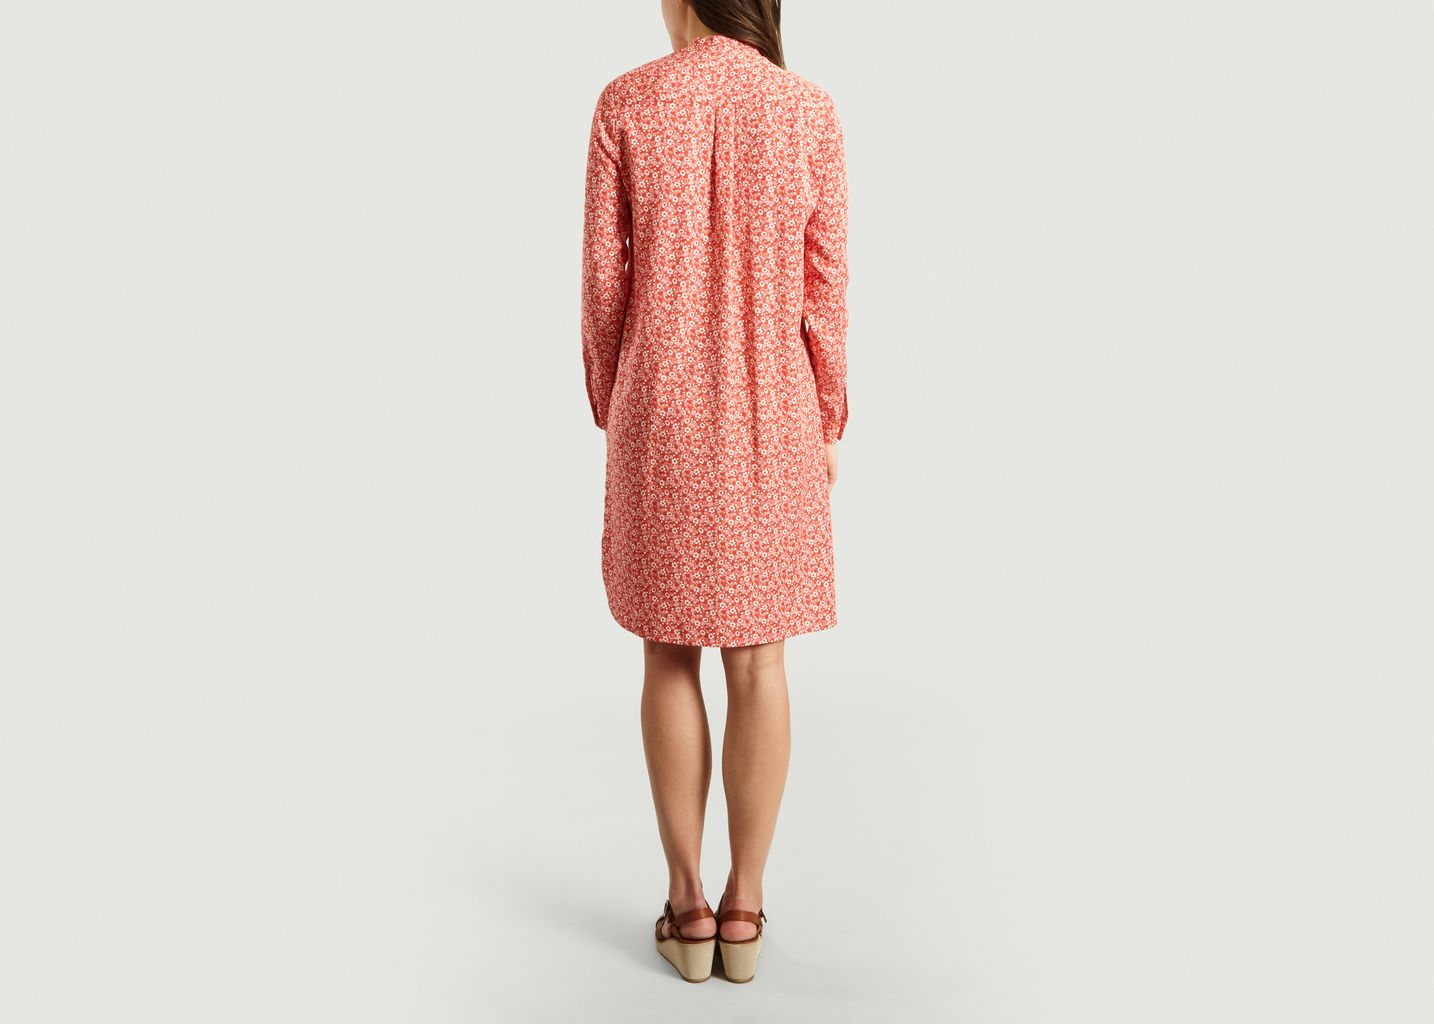 Robe Chemise Fleurie Ginette - Cuisse de Grenouille